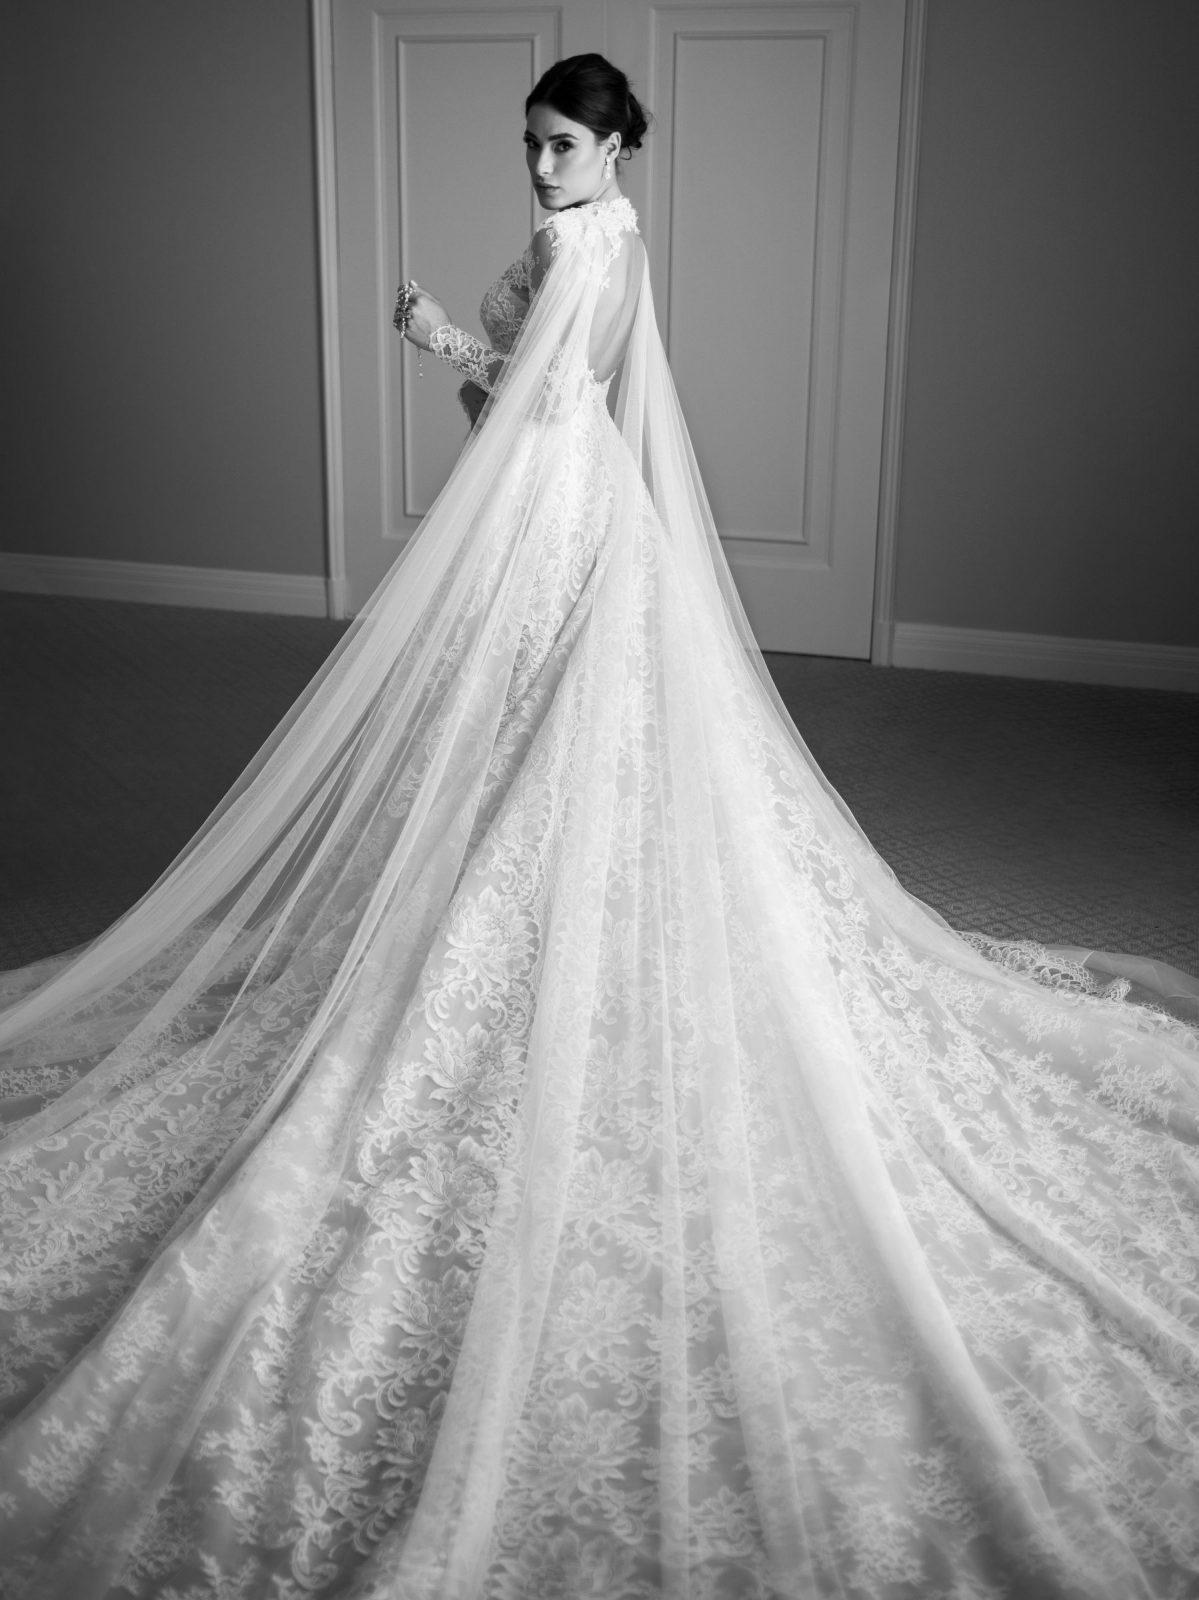 maria-eduardo-montage-beverly-hills-wedding-122.jpg